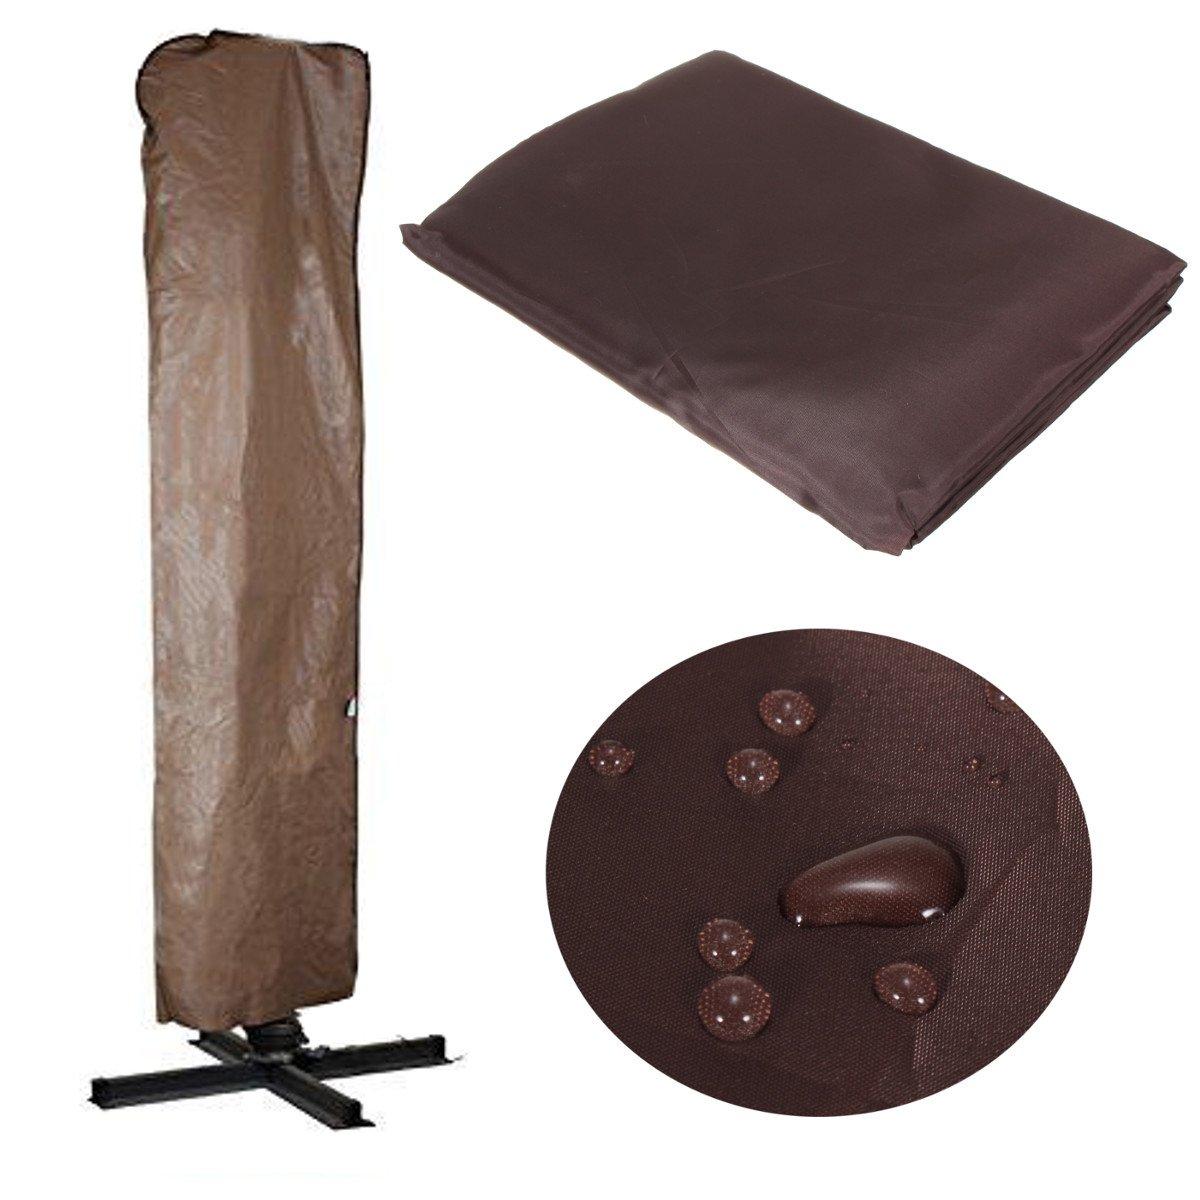 TANCHEN 260x70CM Brown Waterproof Garden Patio Parasol Umbrella Outdoor Canopy Protective Cover